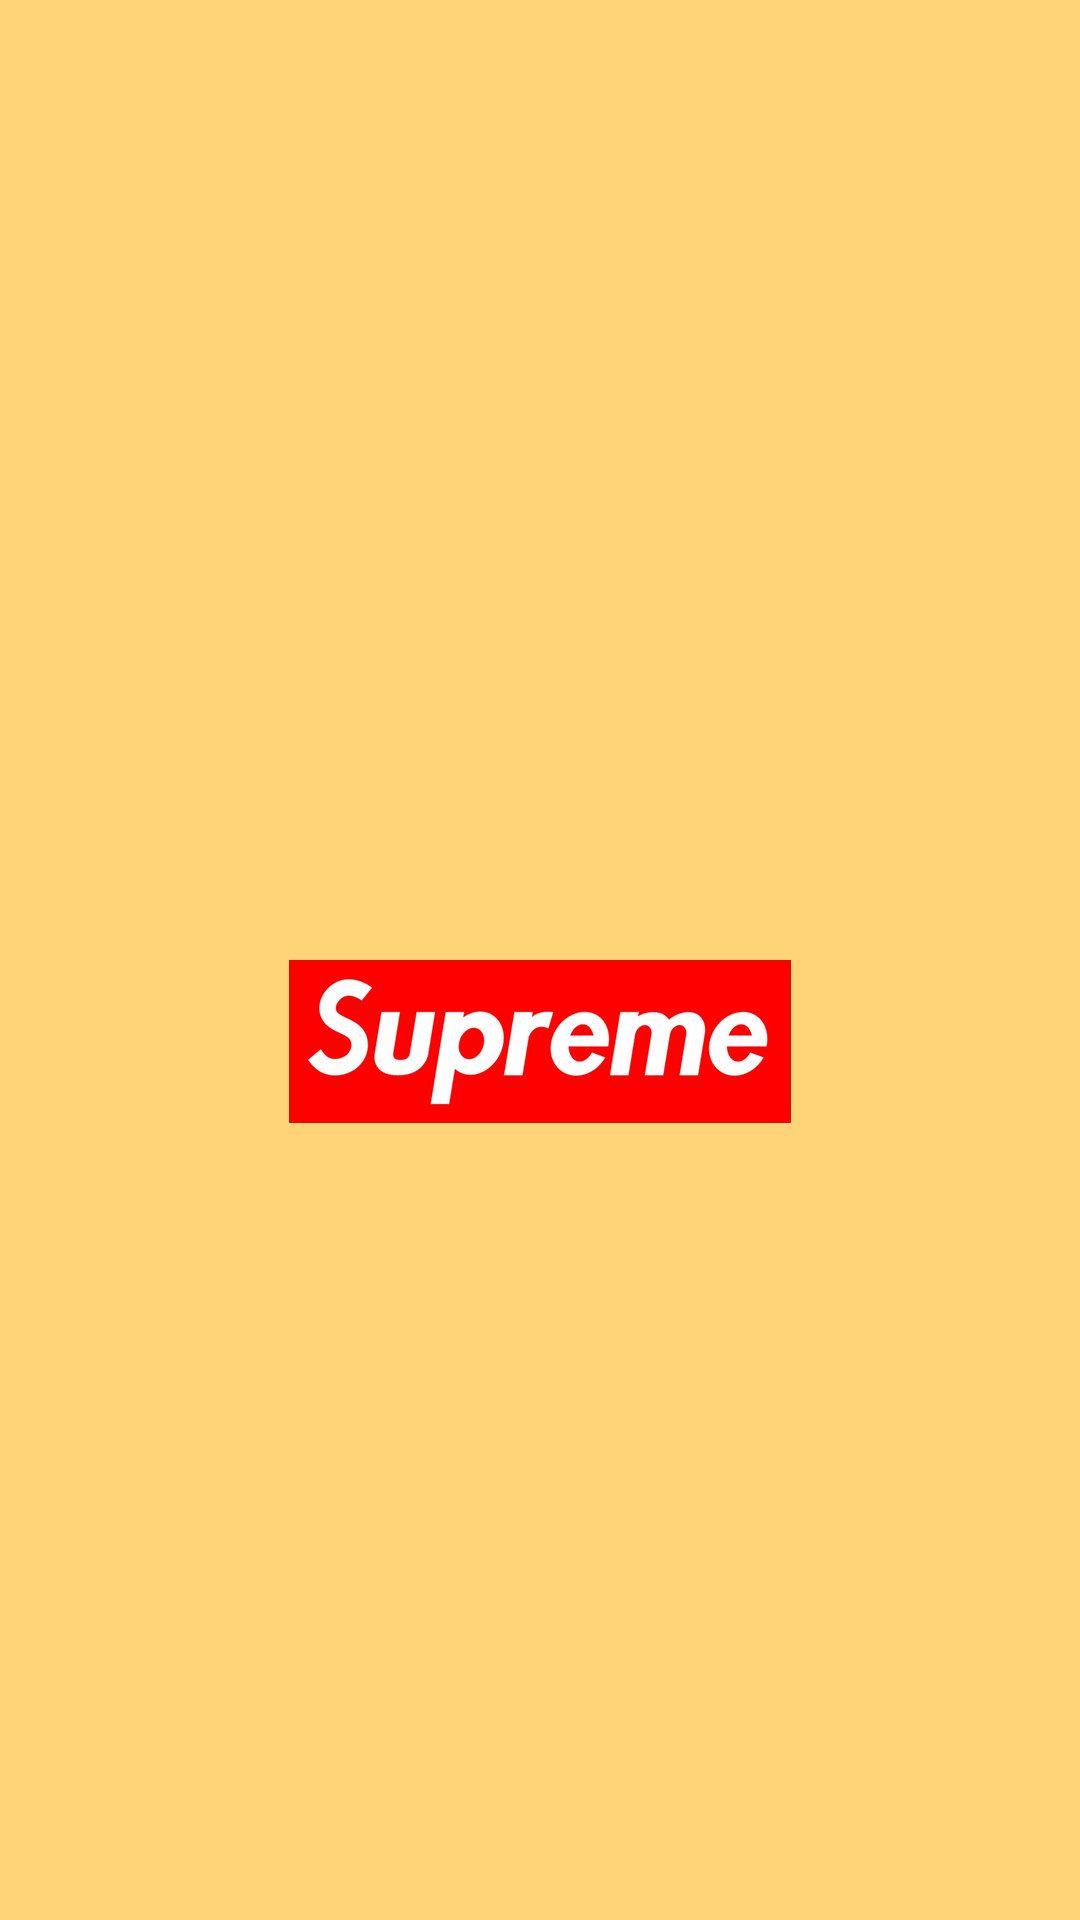 Supreme シュープリーム 05 Wallpapers In 2019